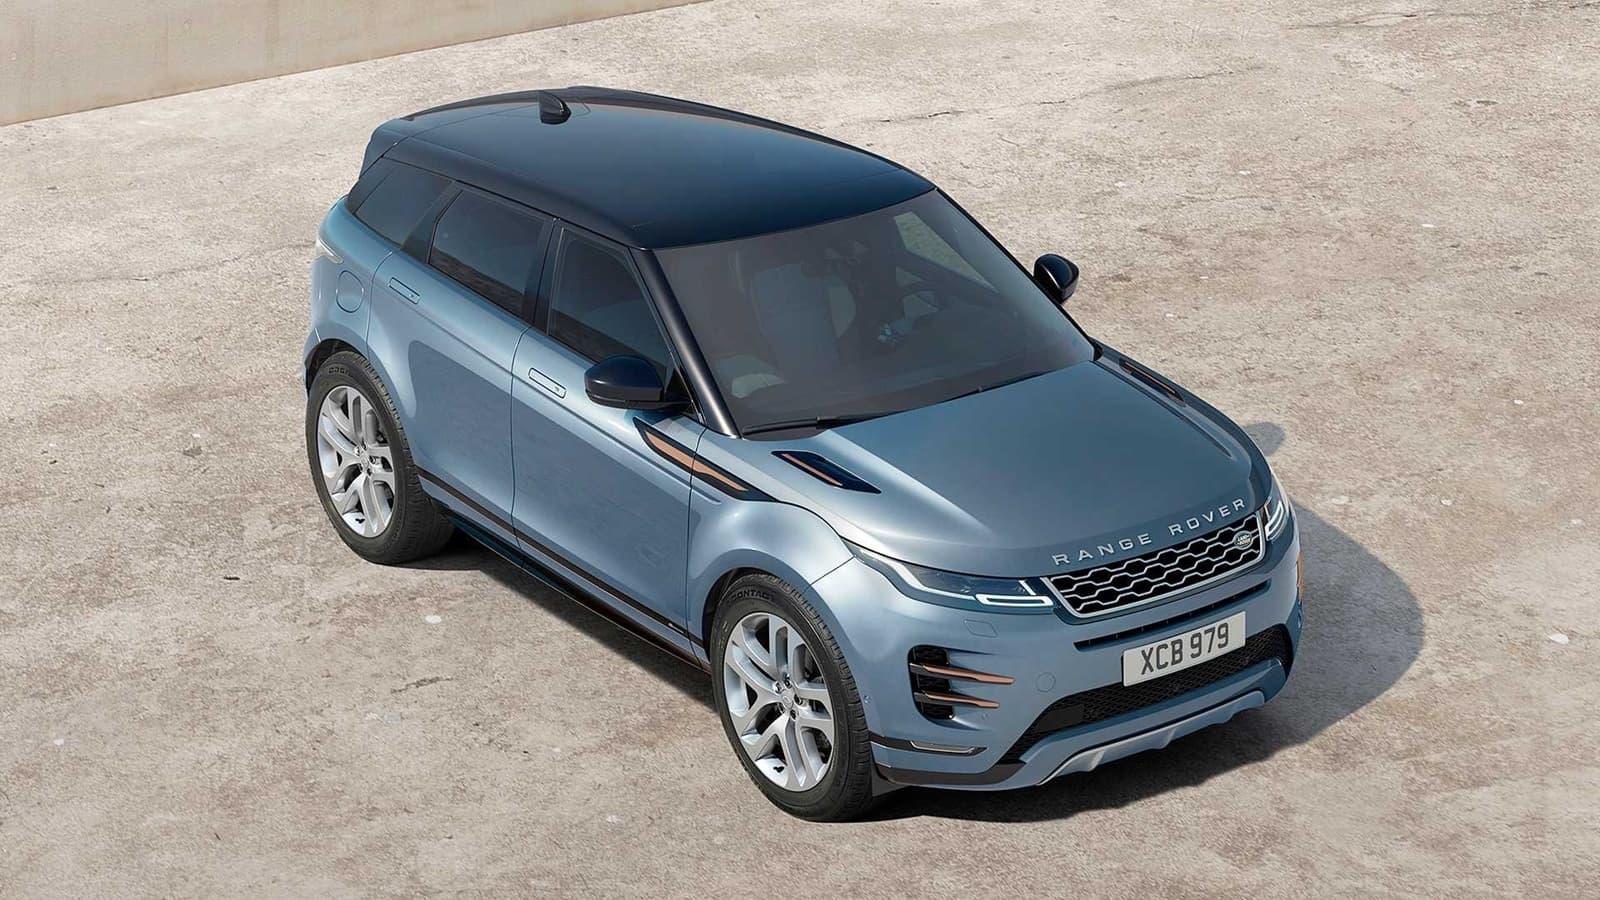 Range Rover Evoque 2019 1118 056